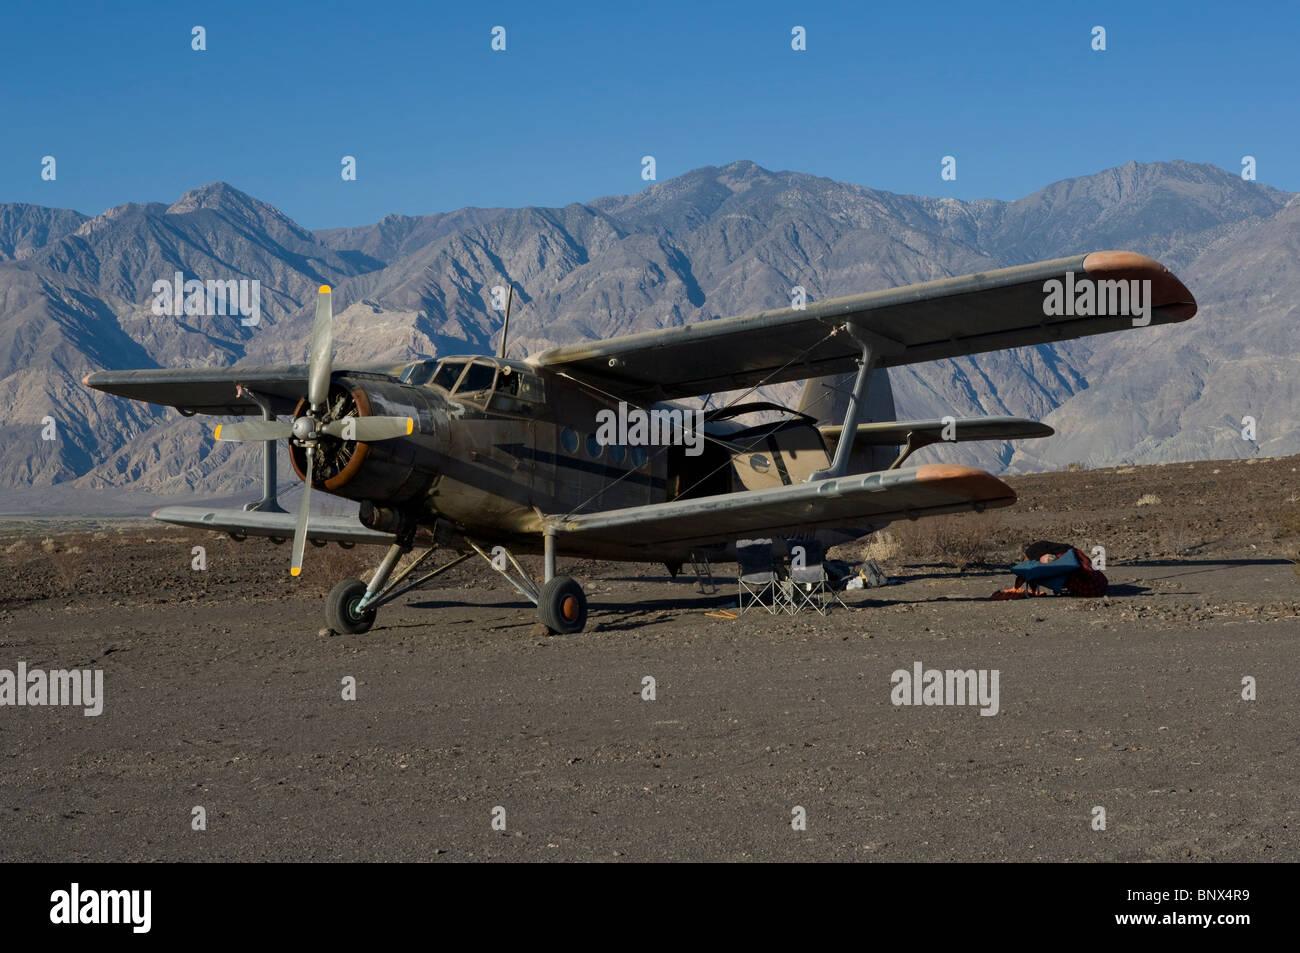 Antonov AN-2 biplane parked at Chicken Strip Saline Valley Death Valley National Park California near hot springs - Stock Image